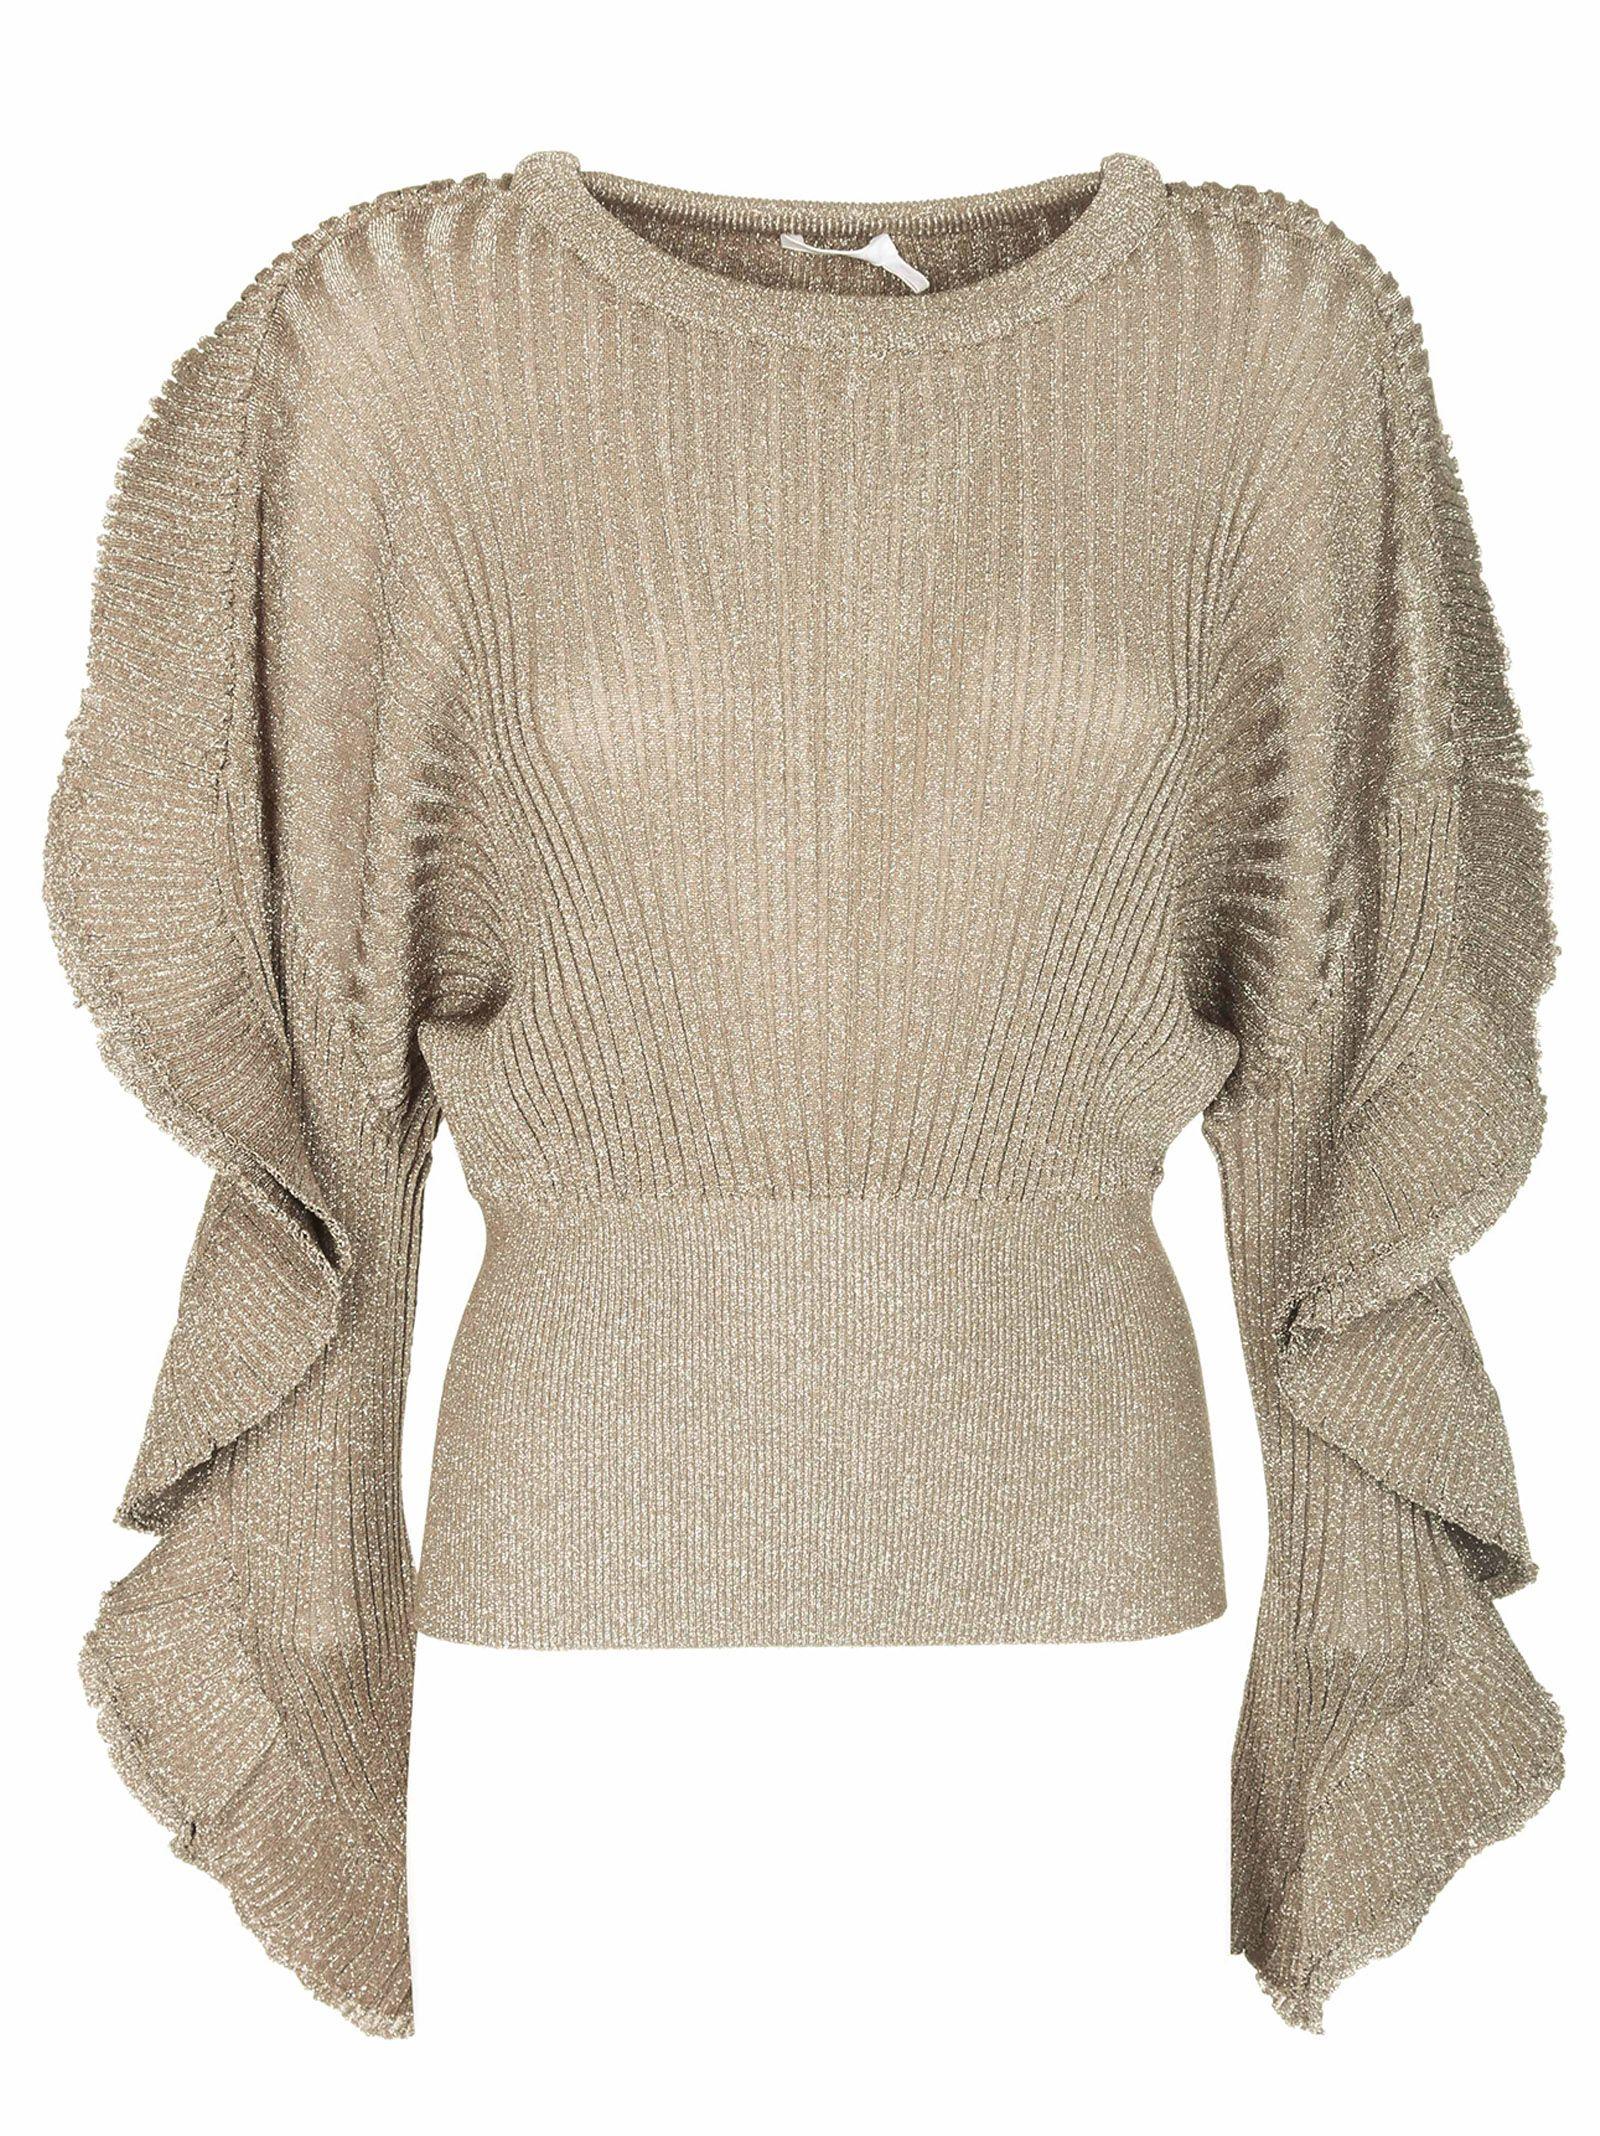 Chloé Ribbed Knit Sweater